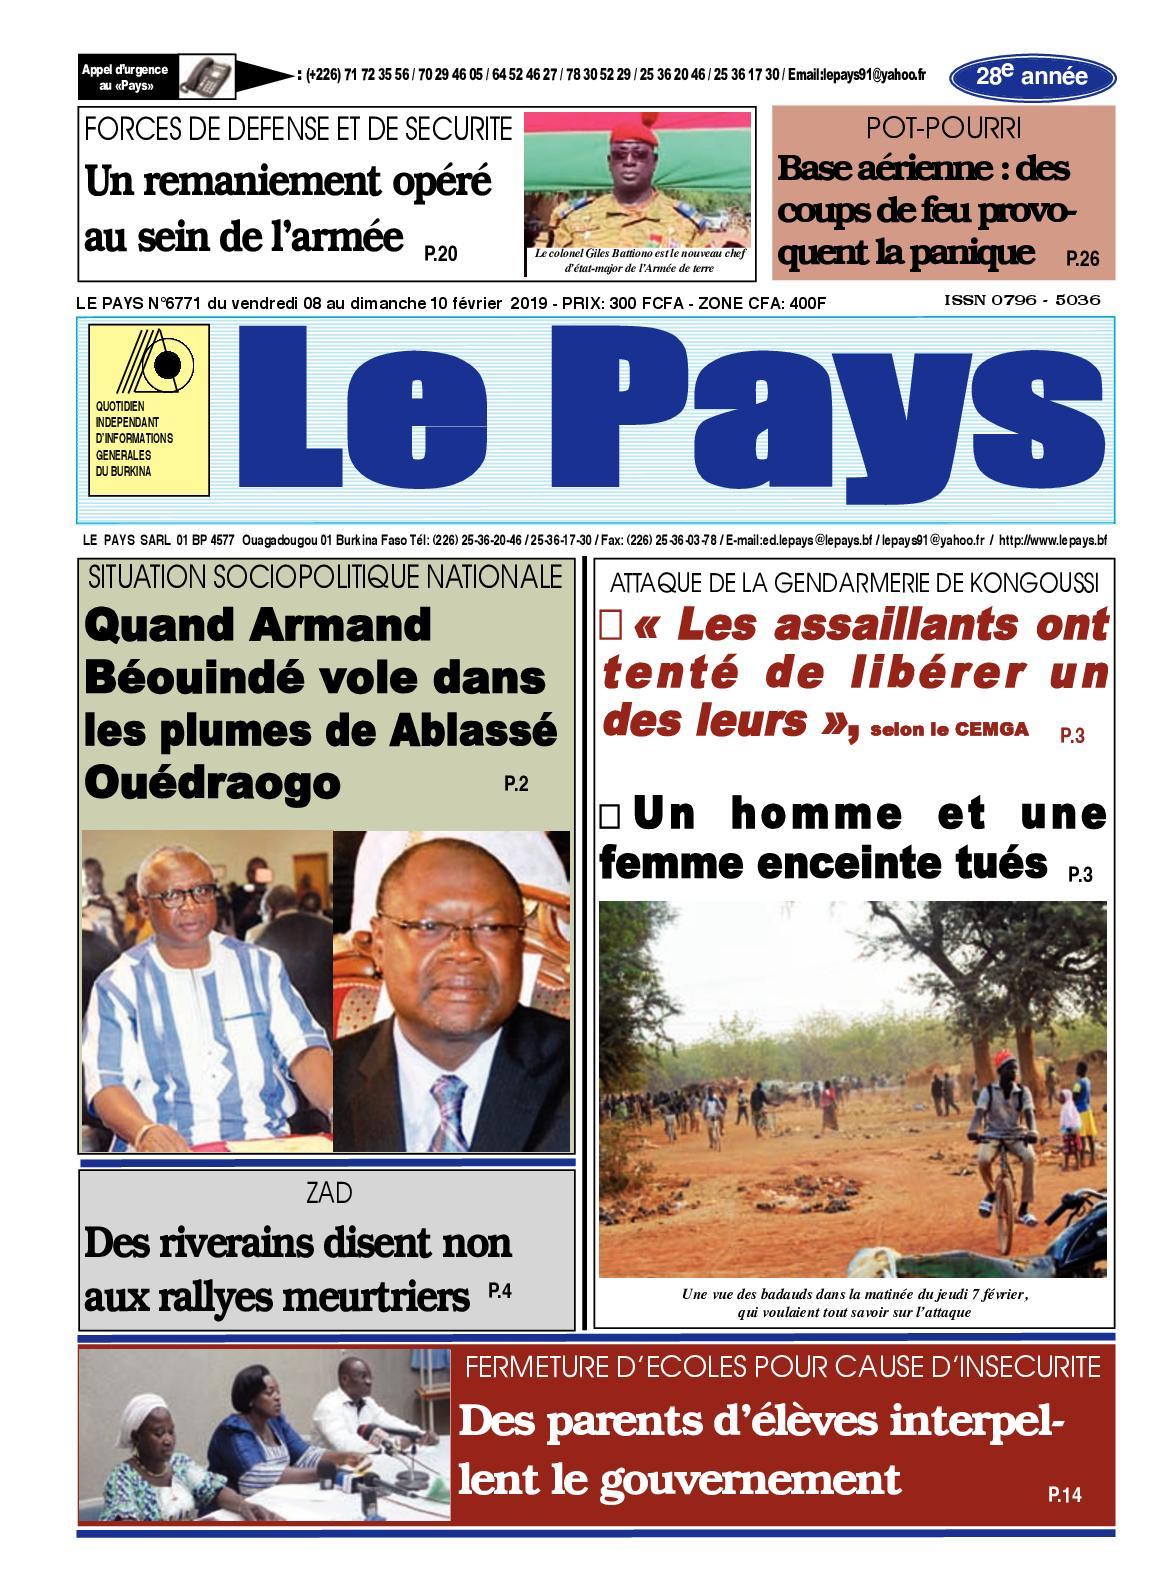 Déjeuner rencontre pour célibataire Ouagadougou Burkina Faso